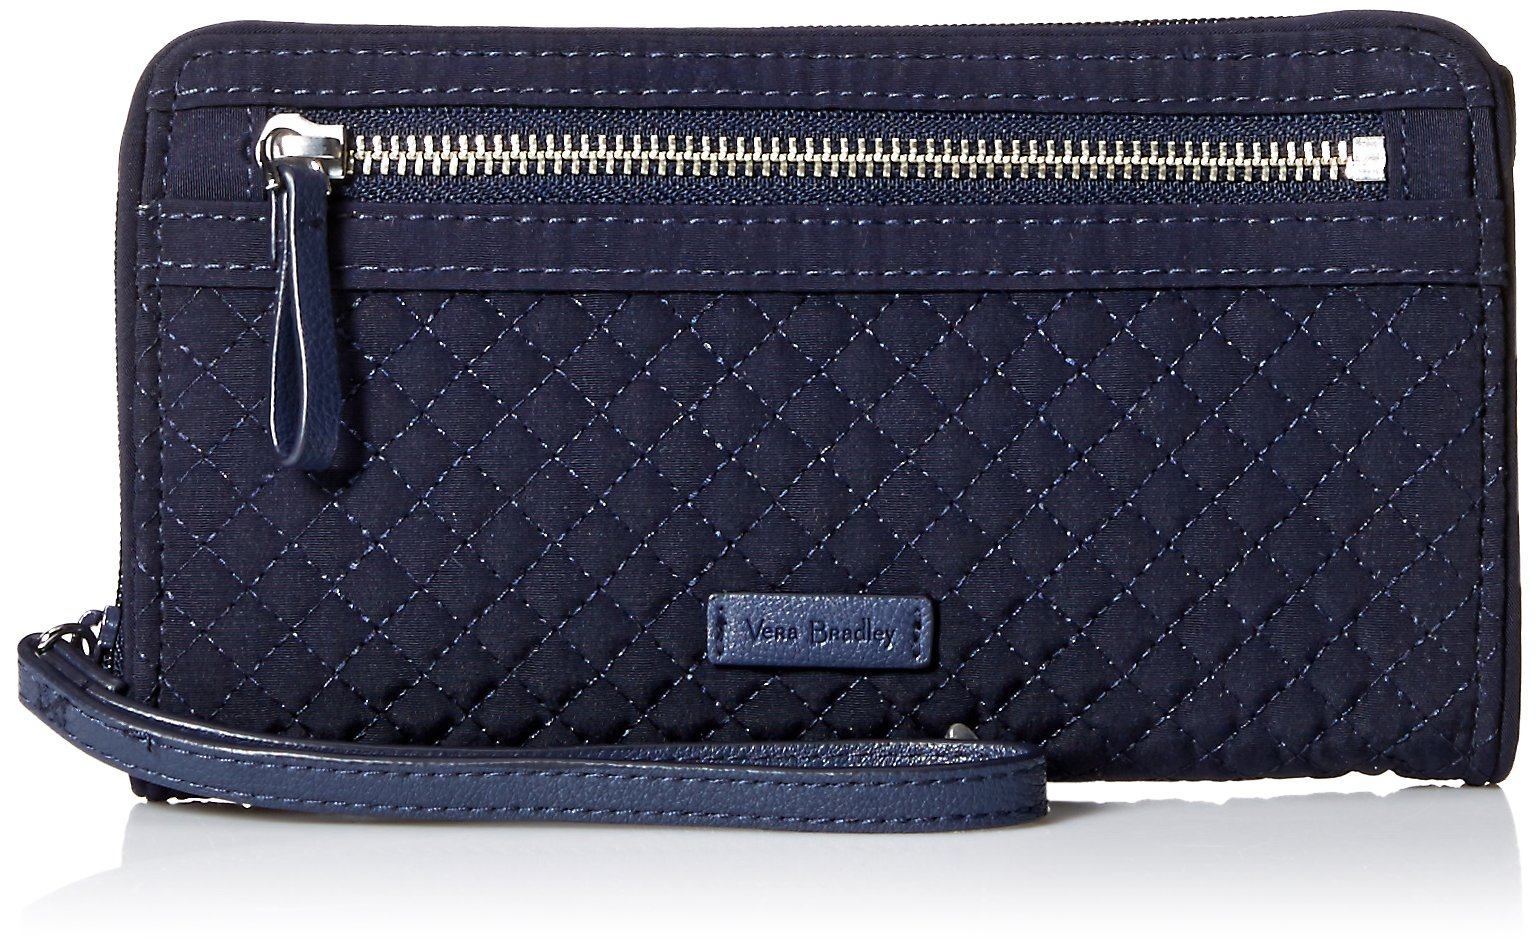 Vera Bradley Iconic Rfid Front Zip Wristlet, Microfiber, Classic Navy